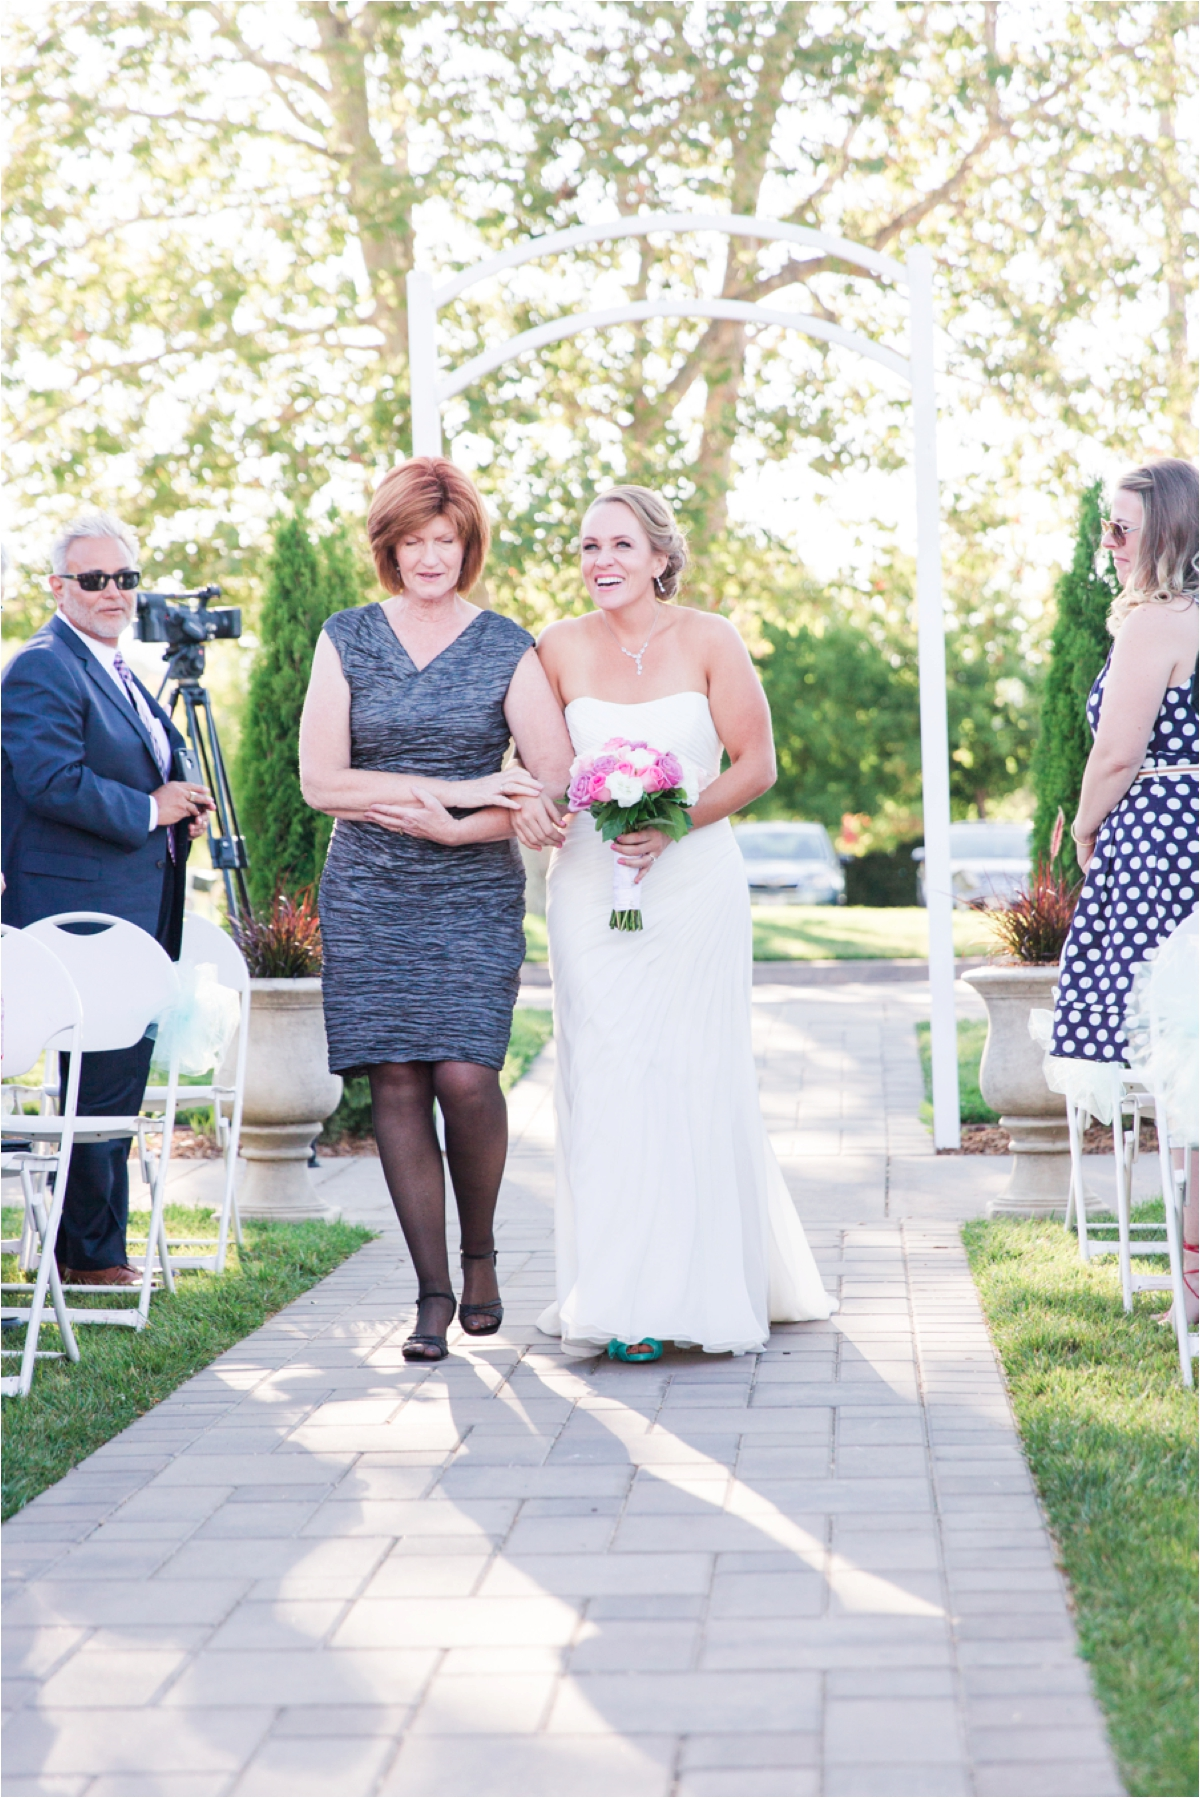 Eagle Ridge Golf Club wedding pictures by Briana Calderon Photography_0432.jpg